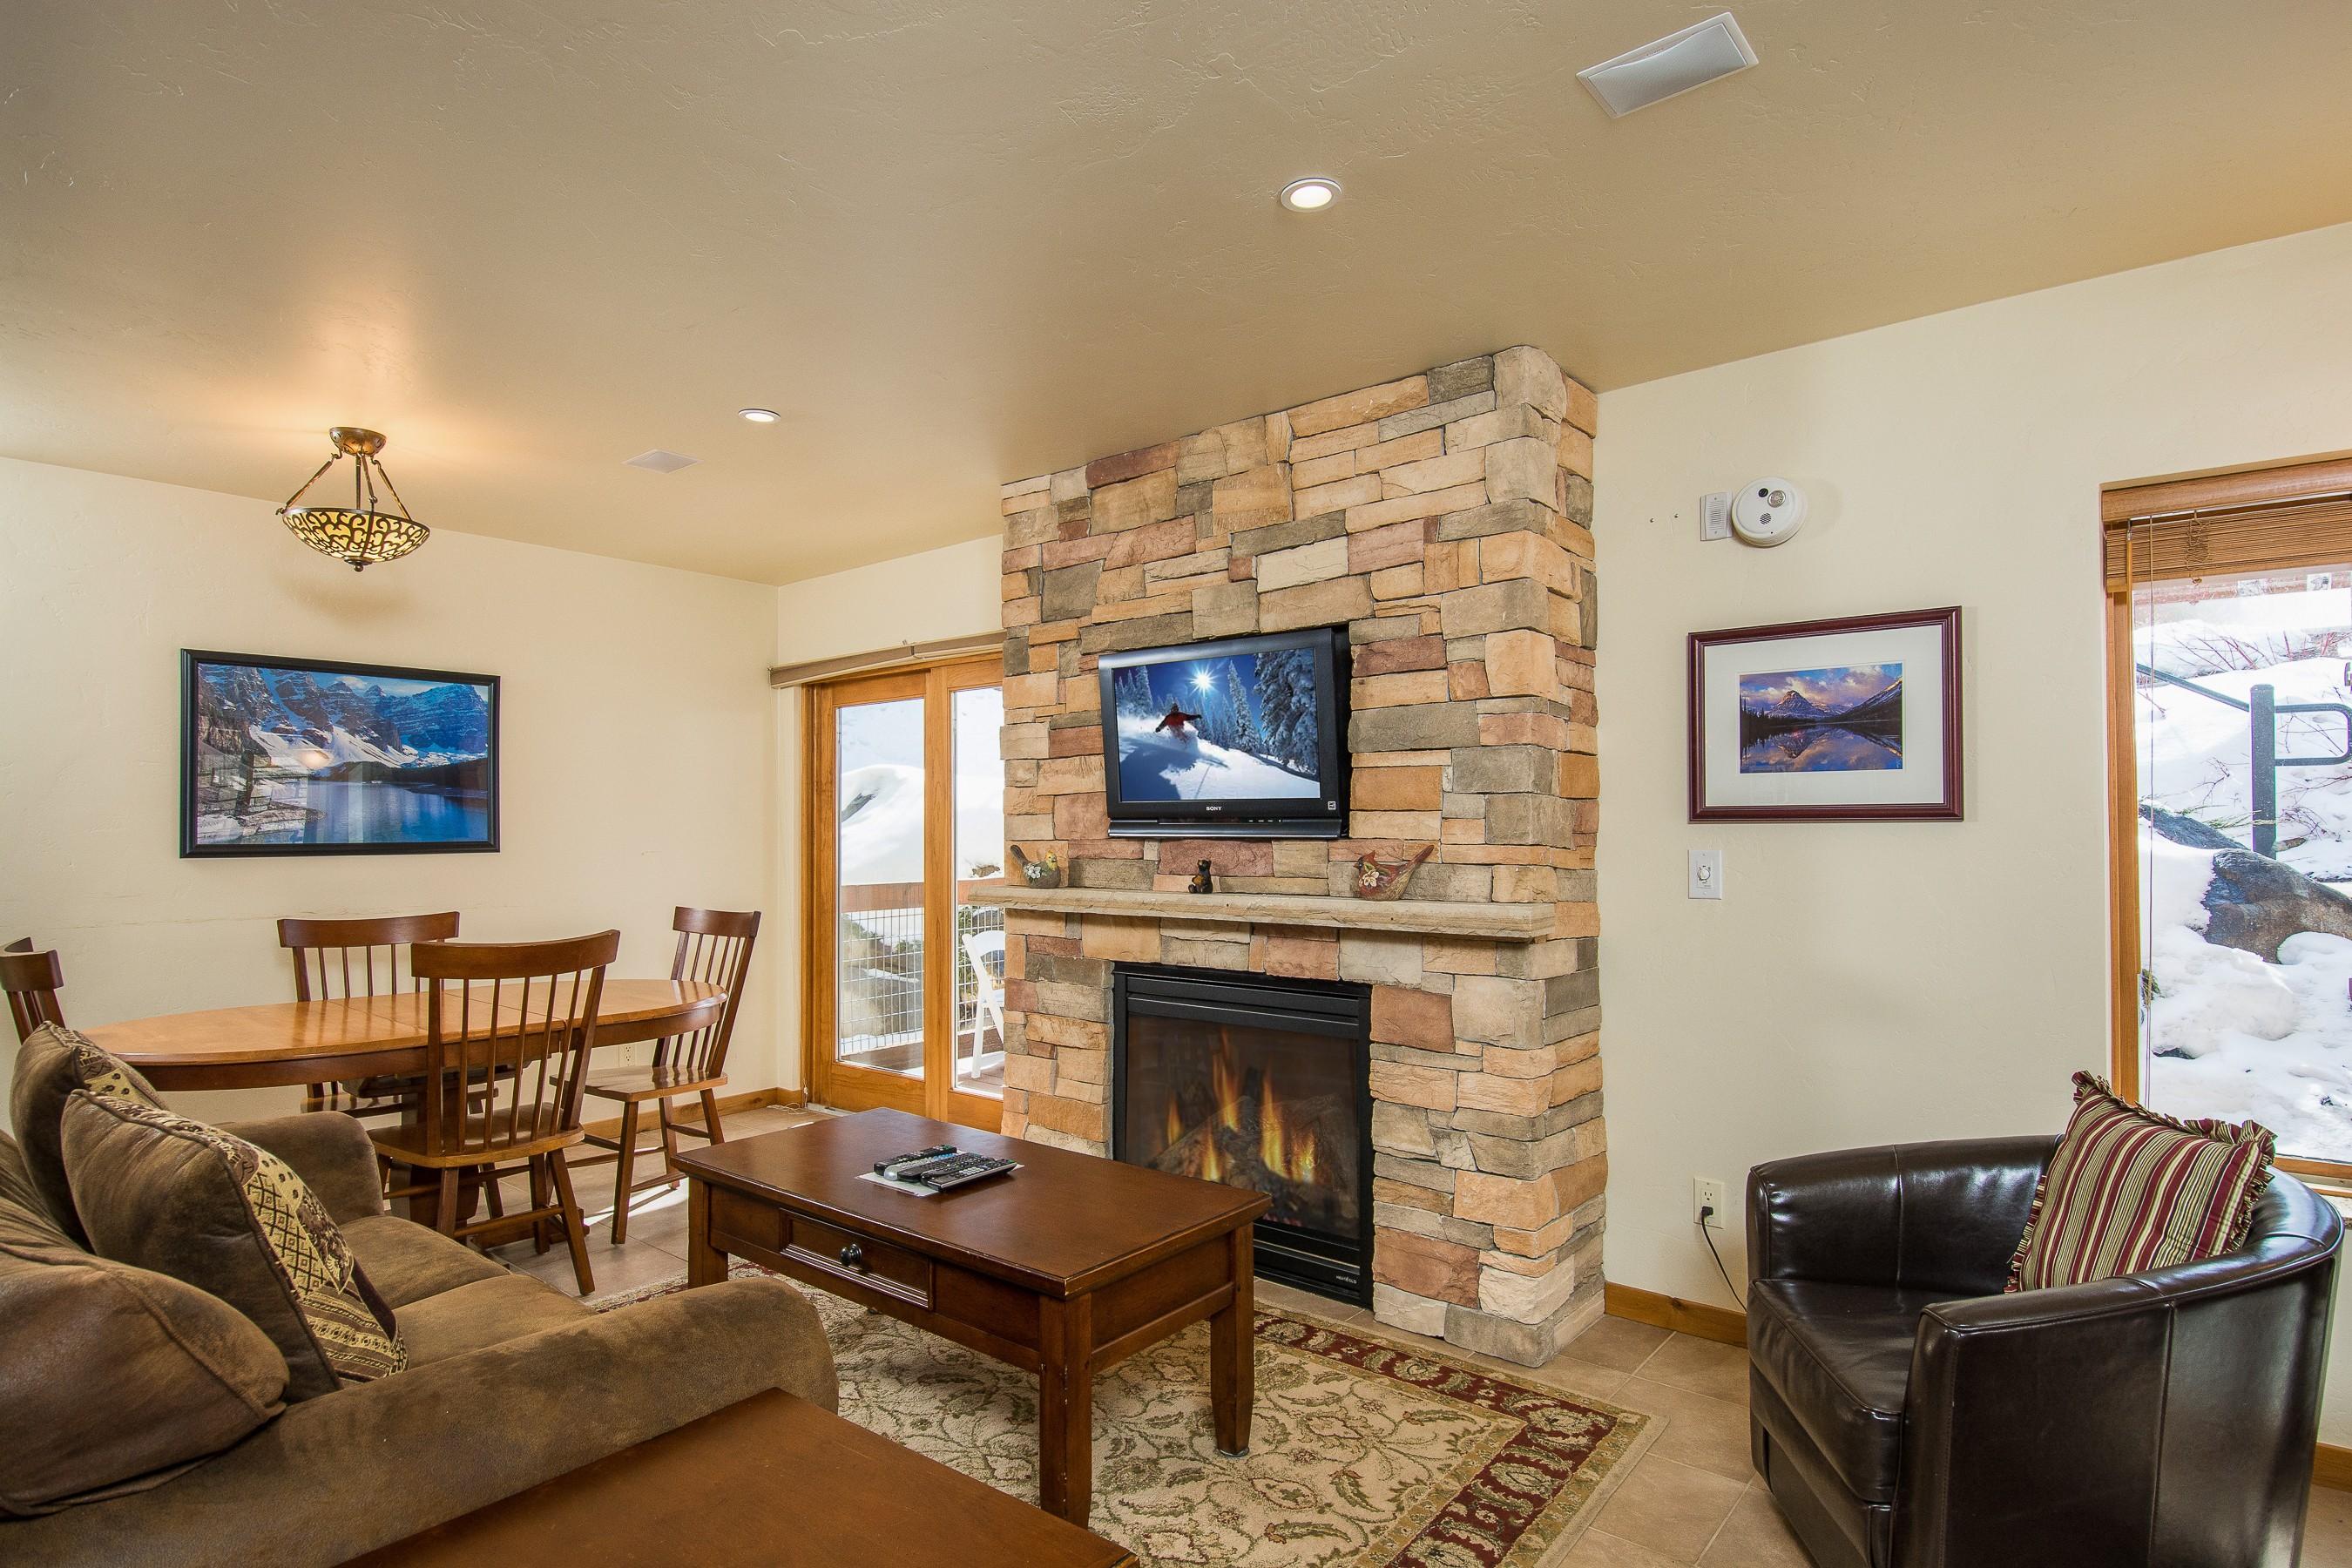 共管物業 為 出售 在 Walk to Skiing, Shopping, Dining and More... 35 Campground Lane C1 & C2 Unit C1 & C2 Snowmass Village, 科羅拉多州, 81615 美國